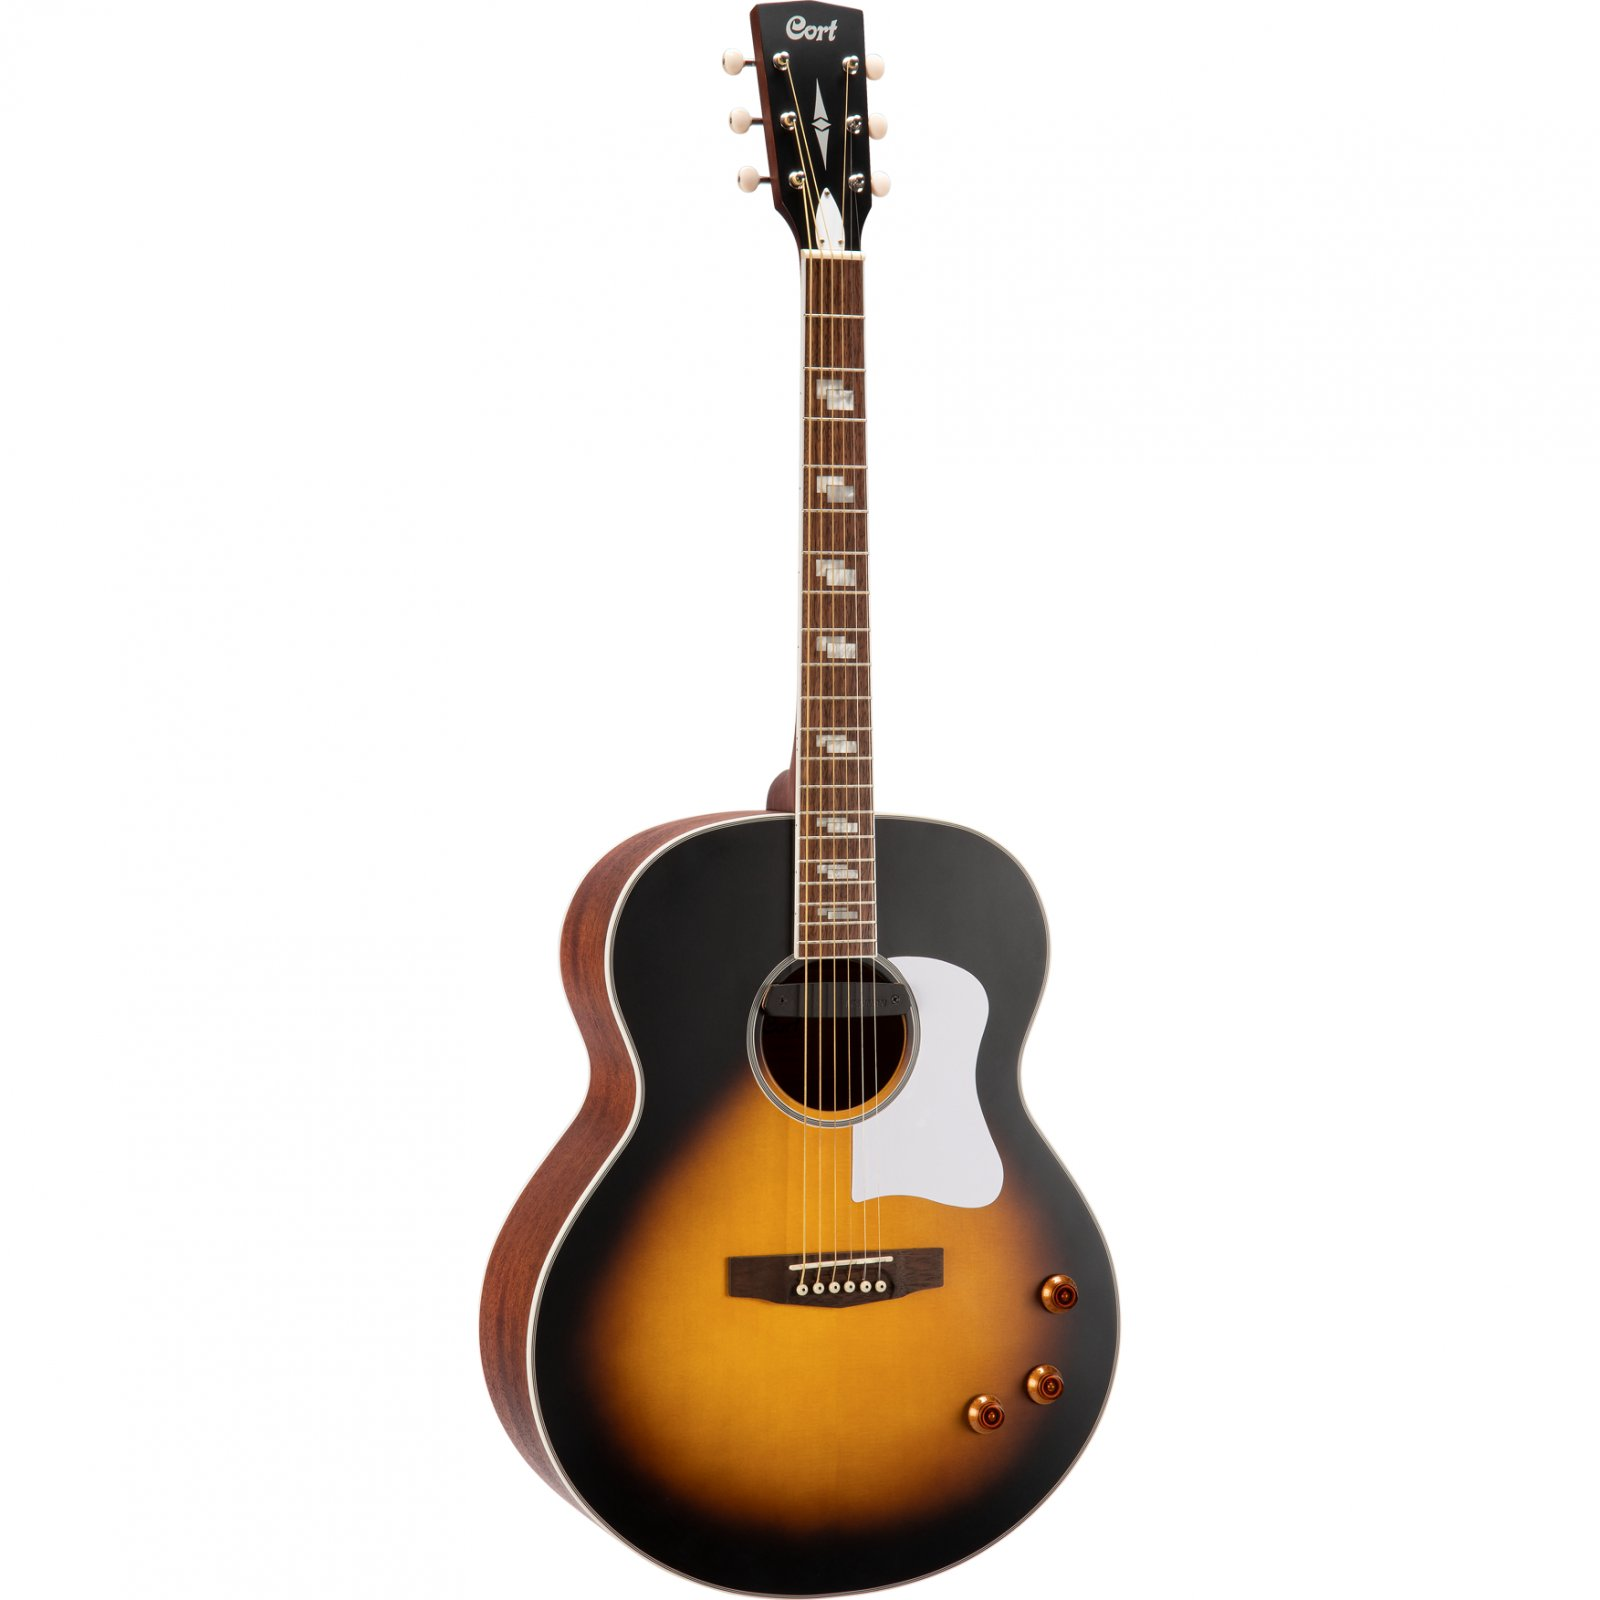 Cort CJ Retro Jumbo Acoustic-Electric Guitar, Vintage Sunburst Matte